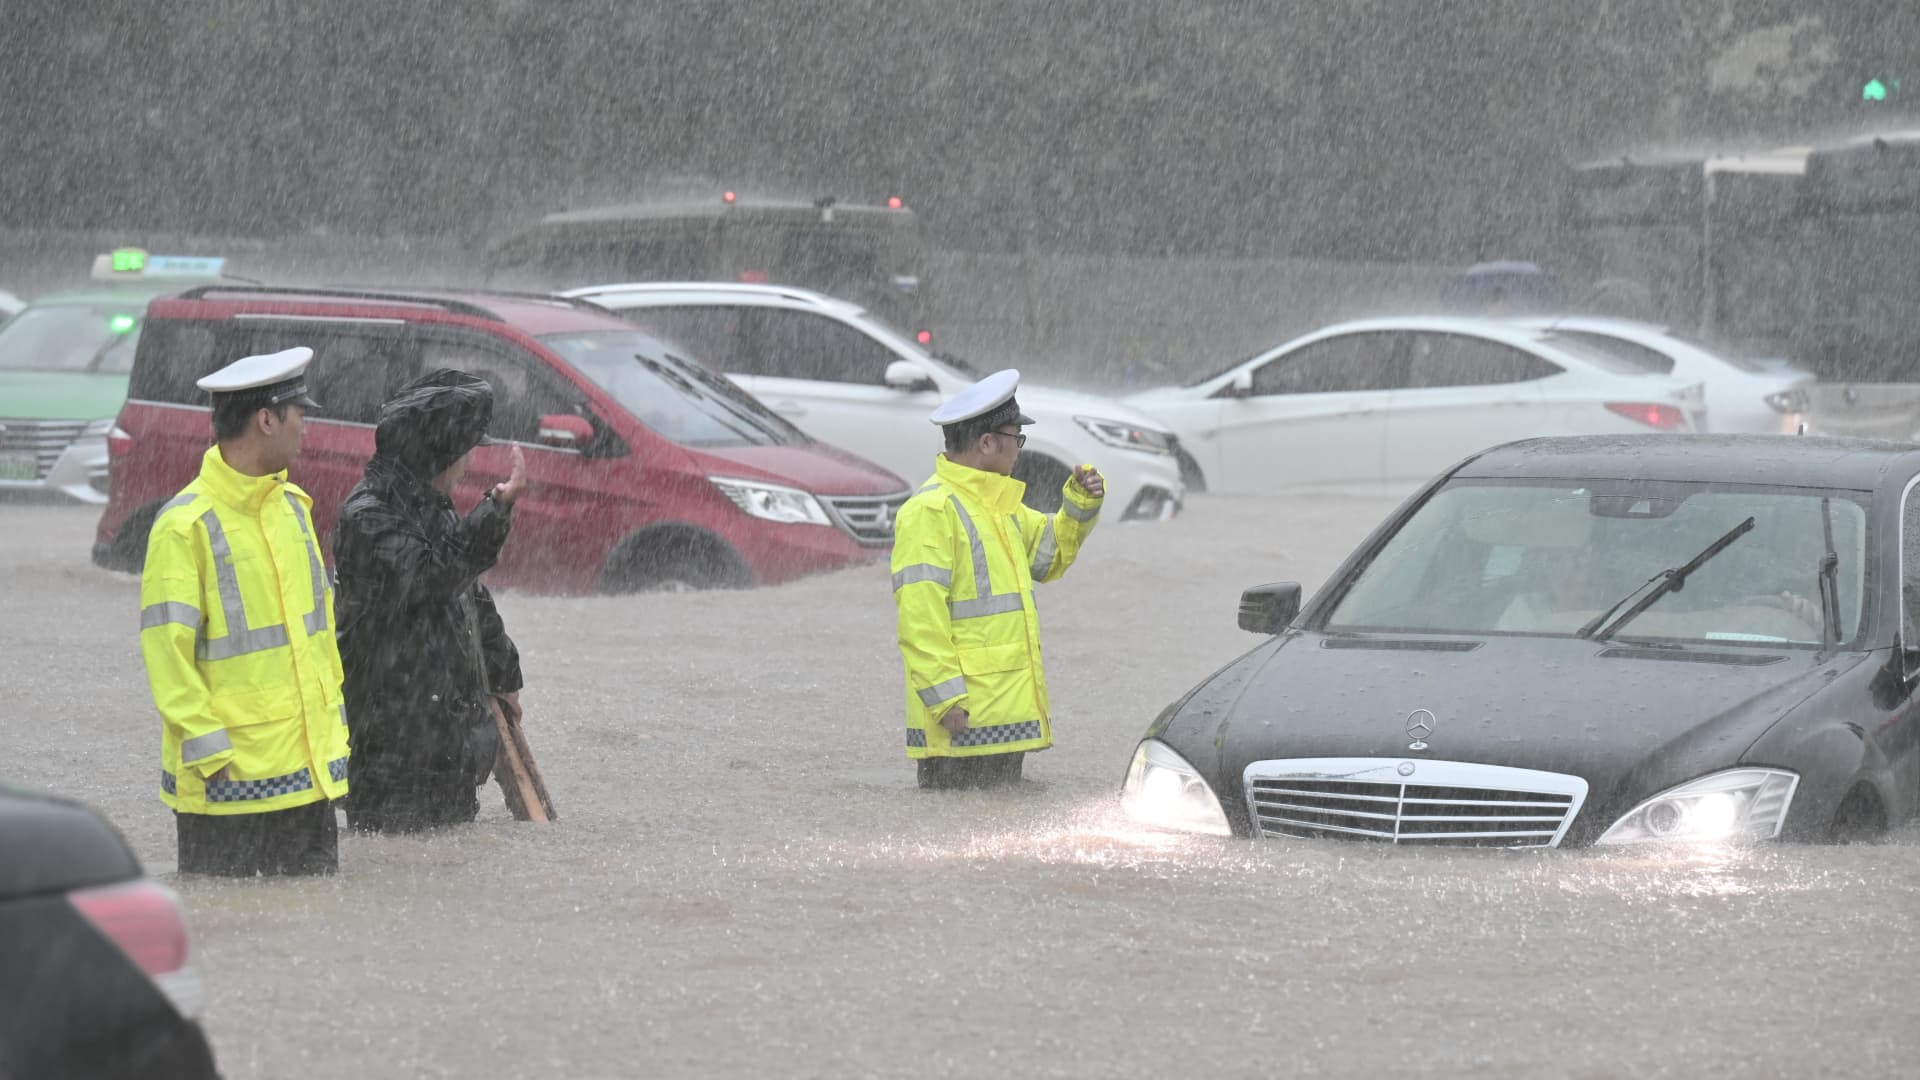 Policemen evacuate traffic in floodwater near Zhengzhou Railway Station on July 20, 2021 in Zhengzhou, Henan Province of China.